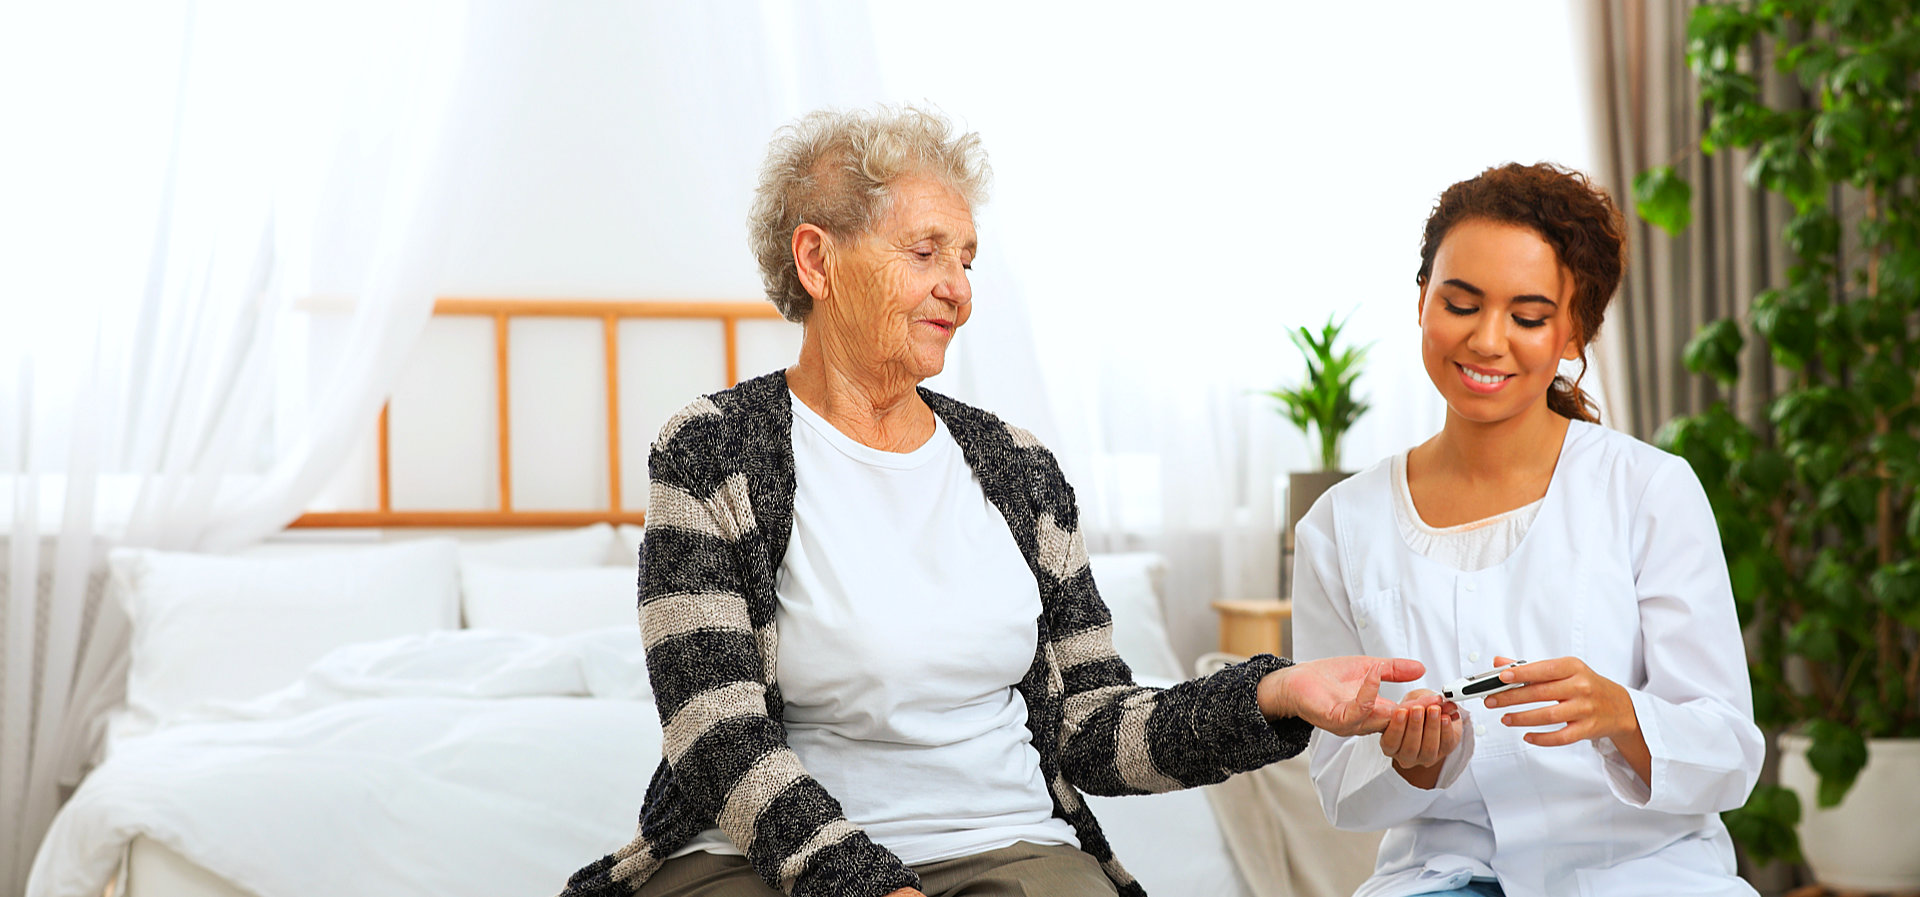 caregiver cutting senior woman's nails